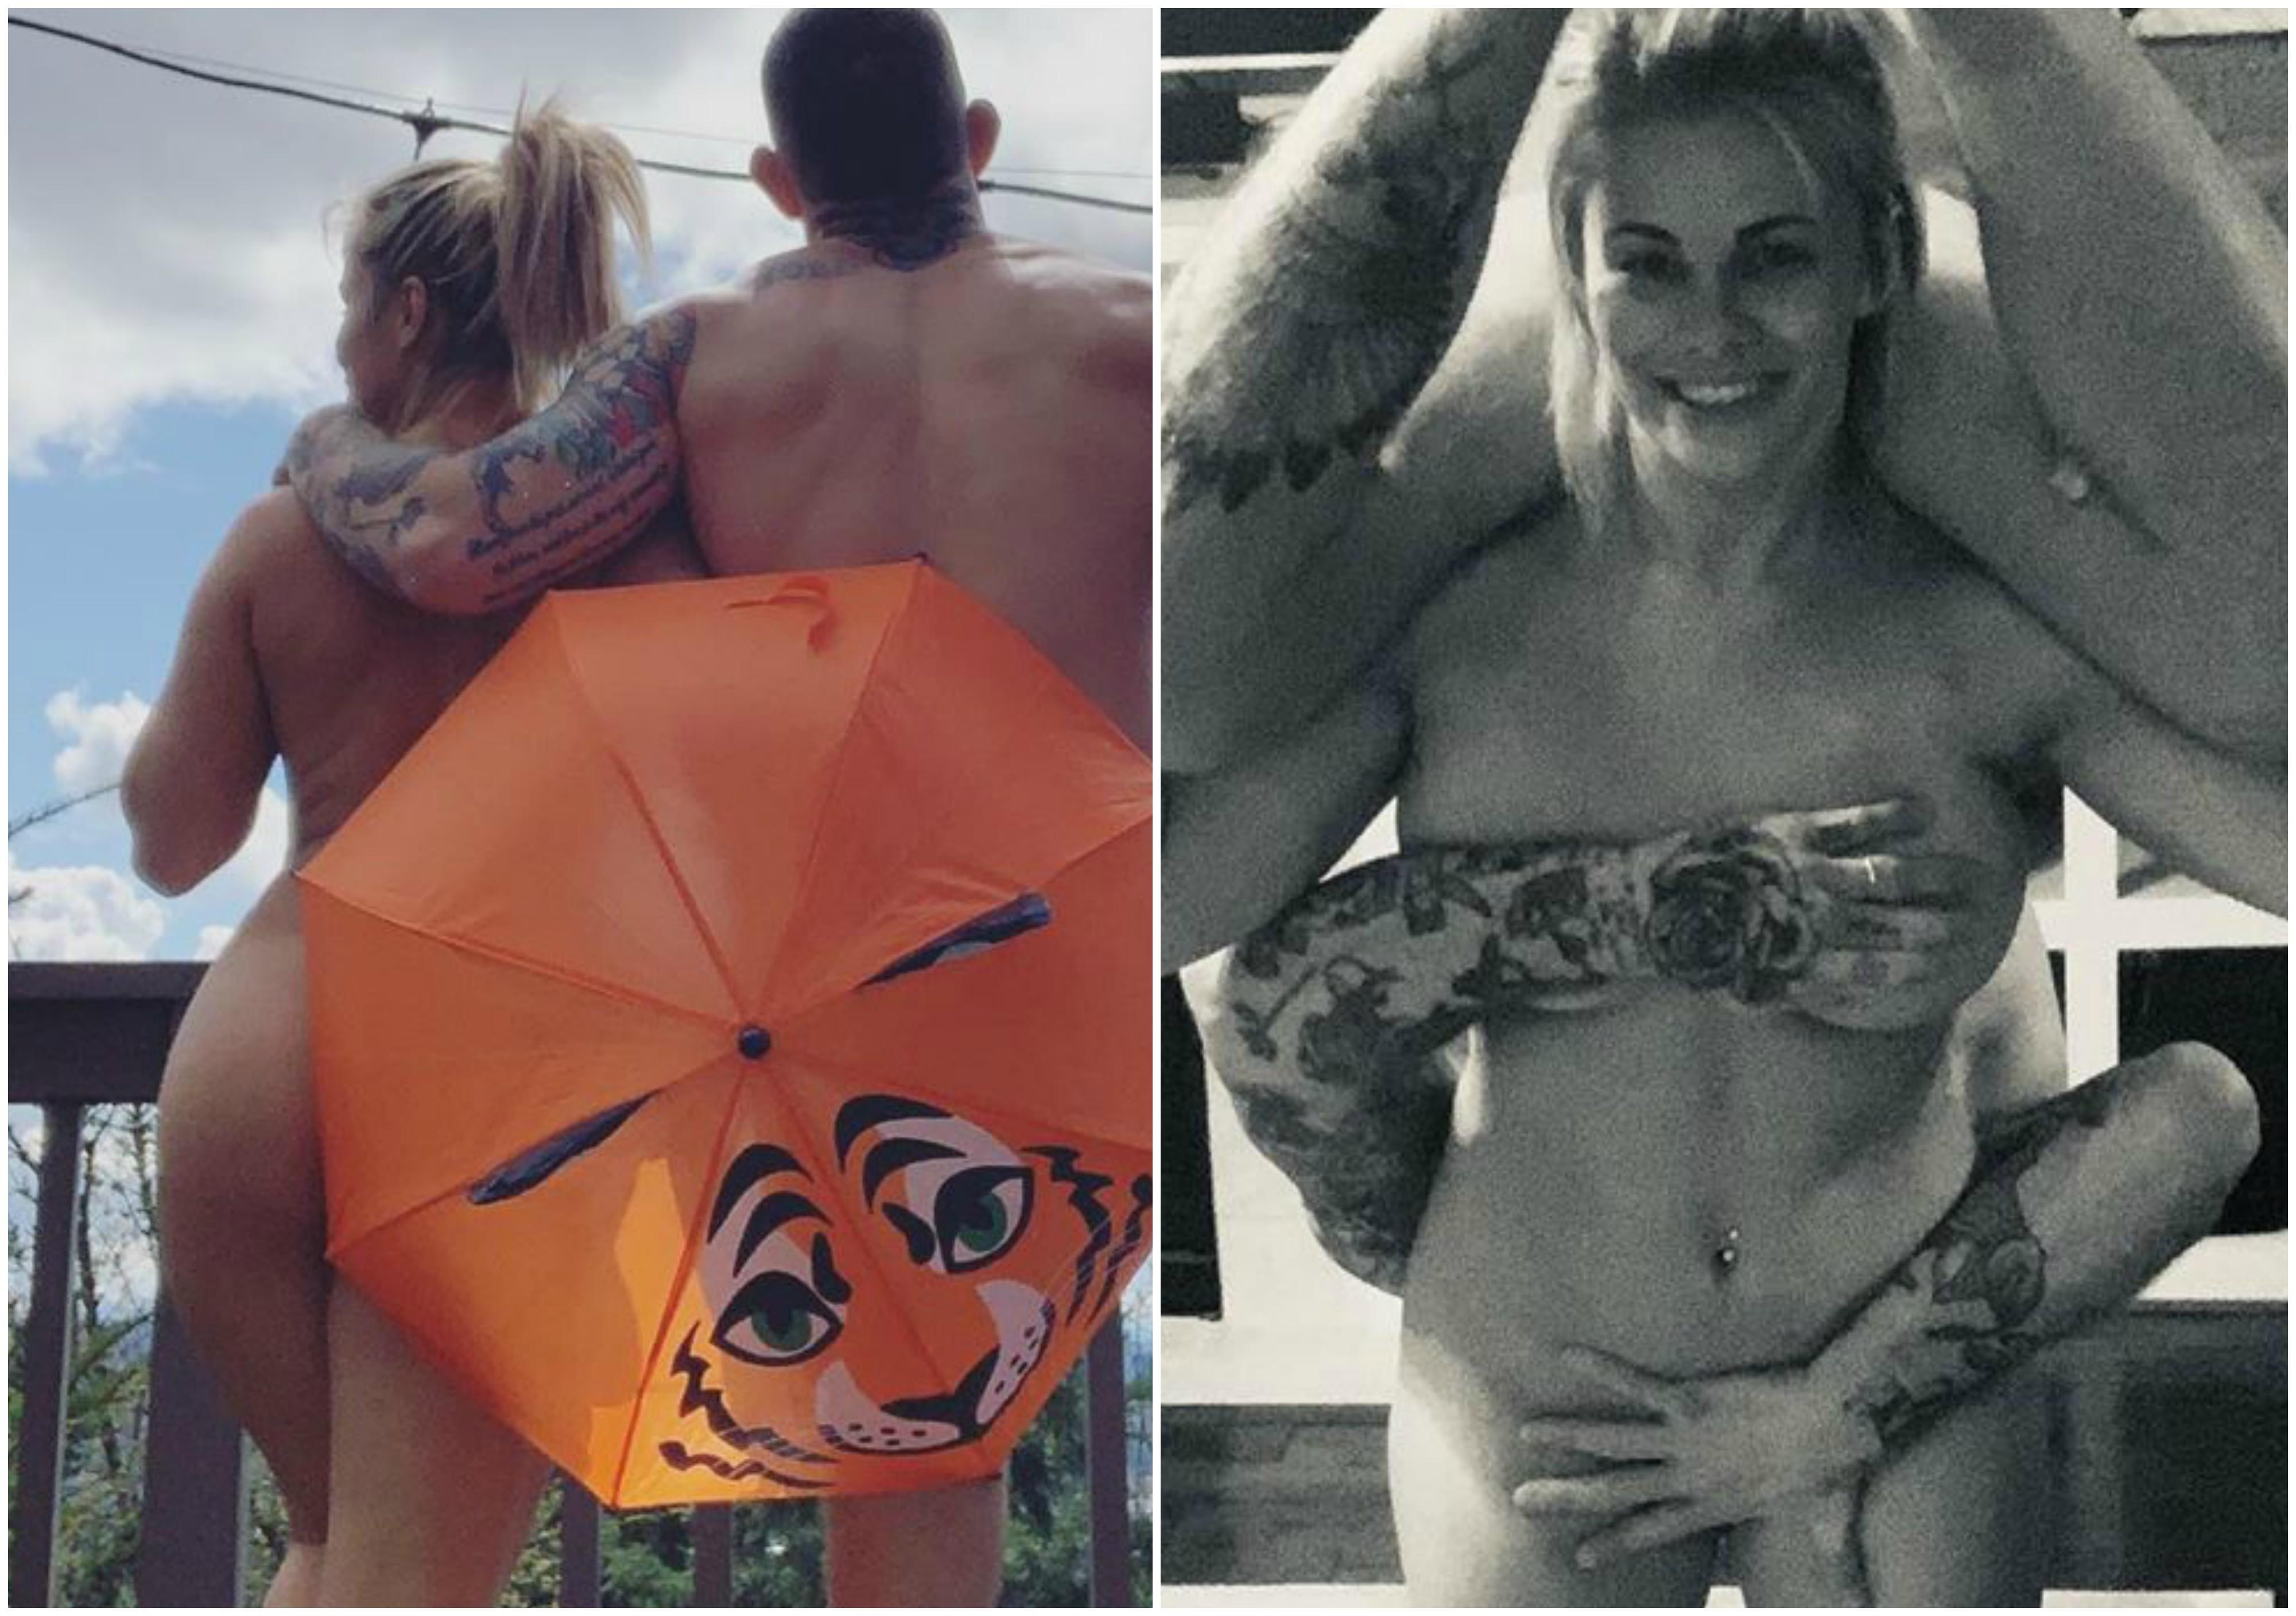 UFC News: PVZ sent unsolicited genital images after sharing her number publicly! - PVZ